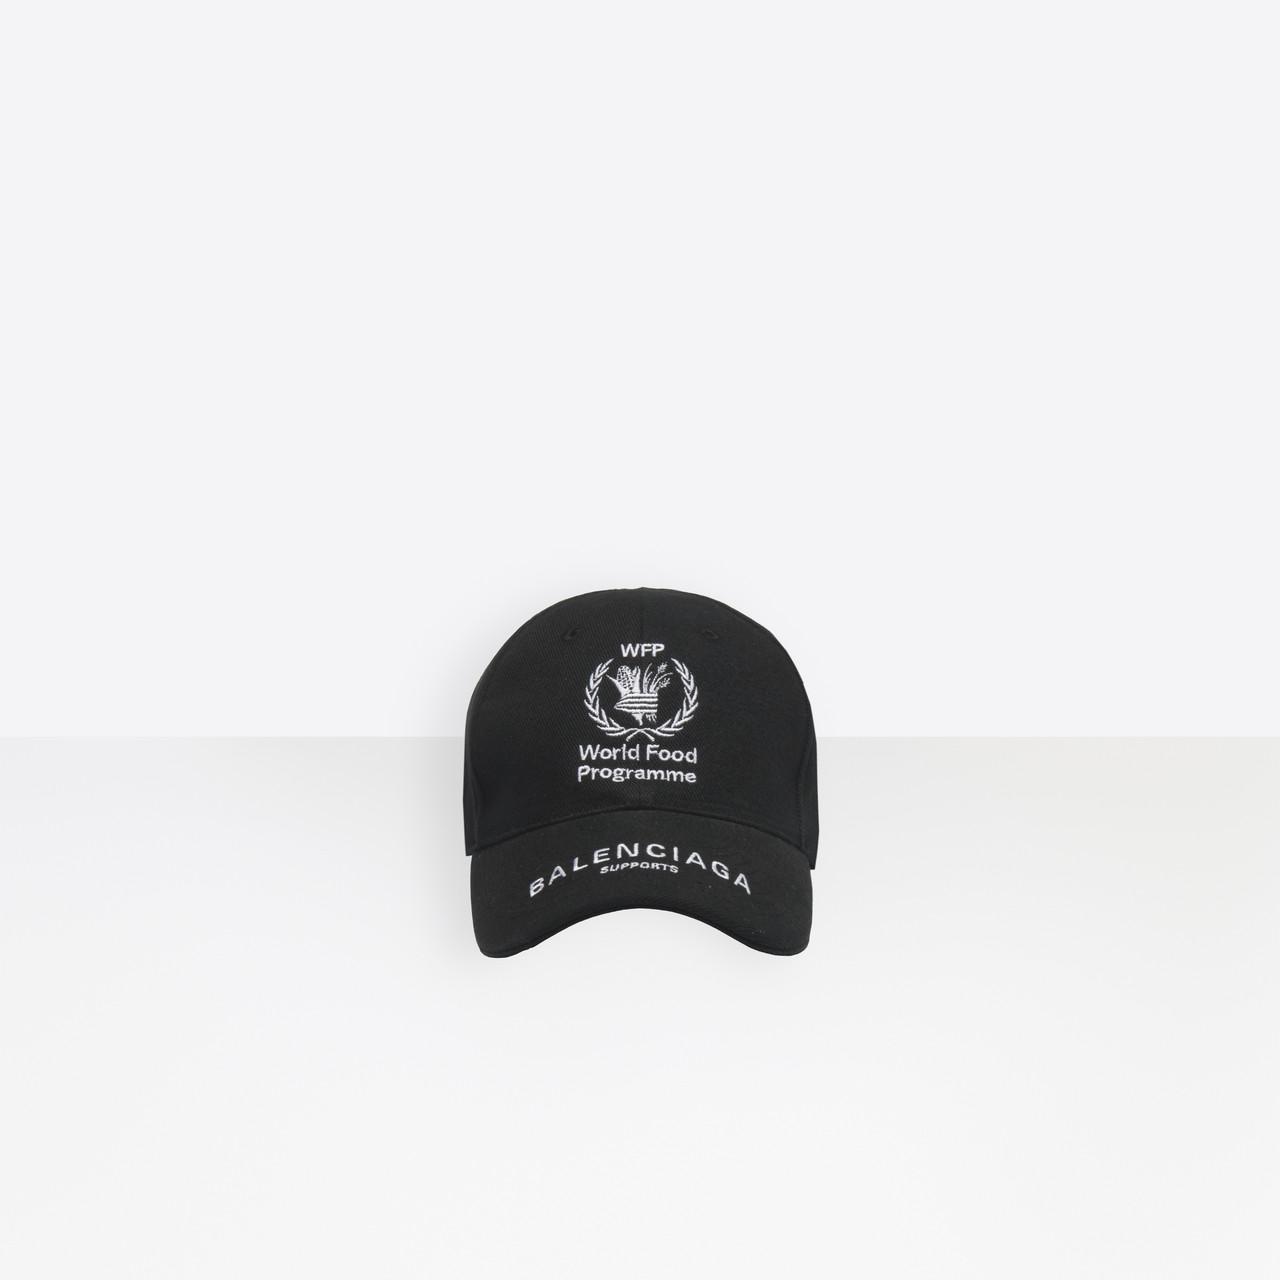 dd52b03161d Lyst - Balenciaga World Food Programme Cap in Black for Men - Save 16%